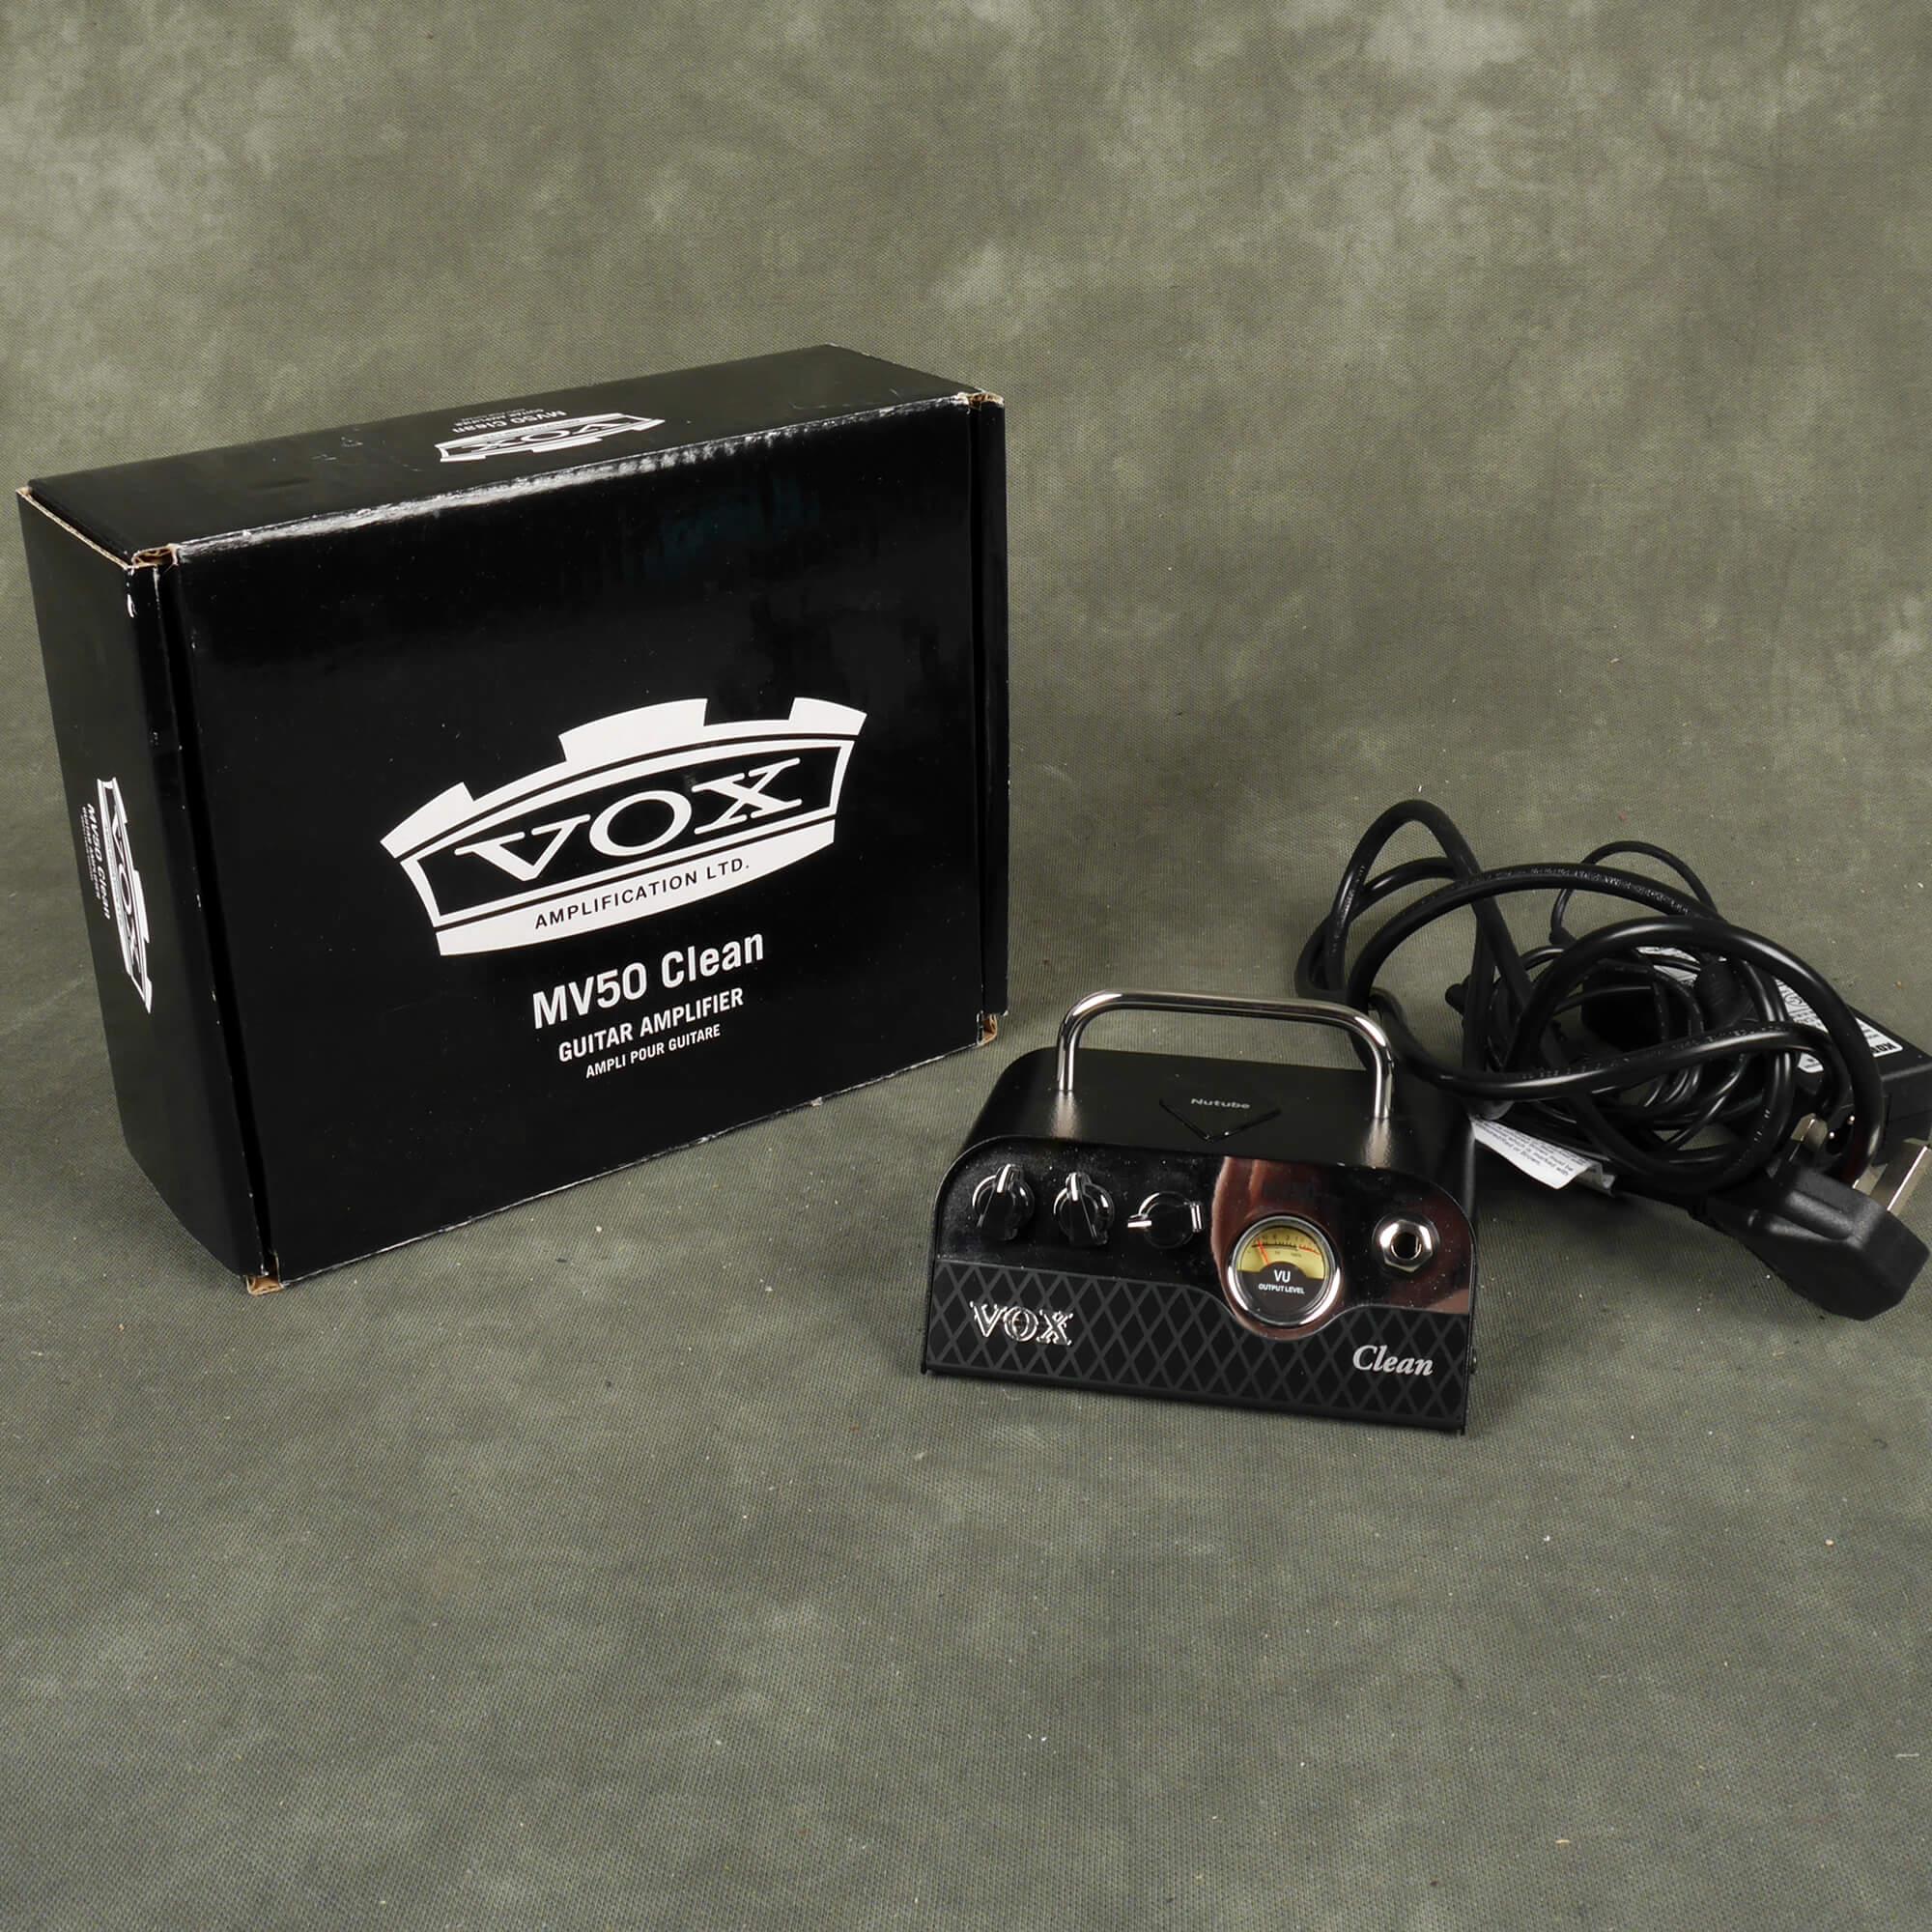 Vox MV50 Clean Mini Amplifier Head w/Box & PSU - 2nd Hand